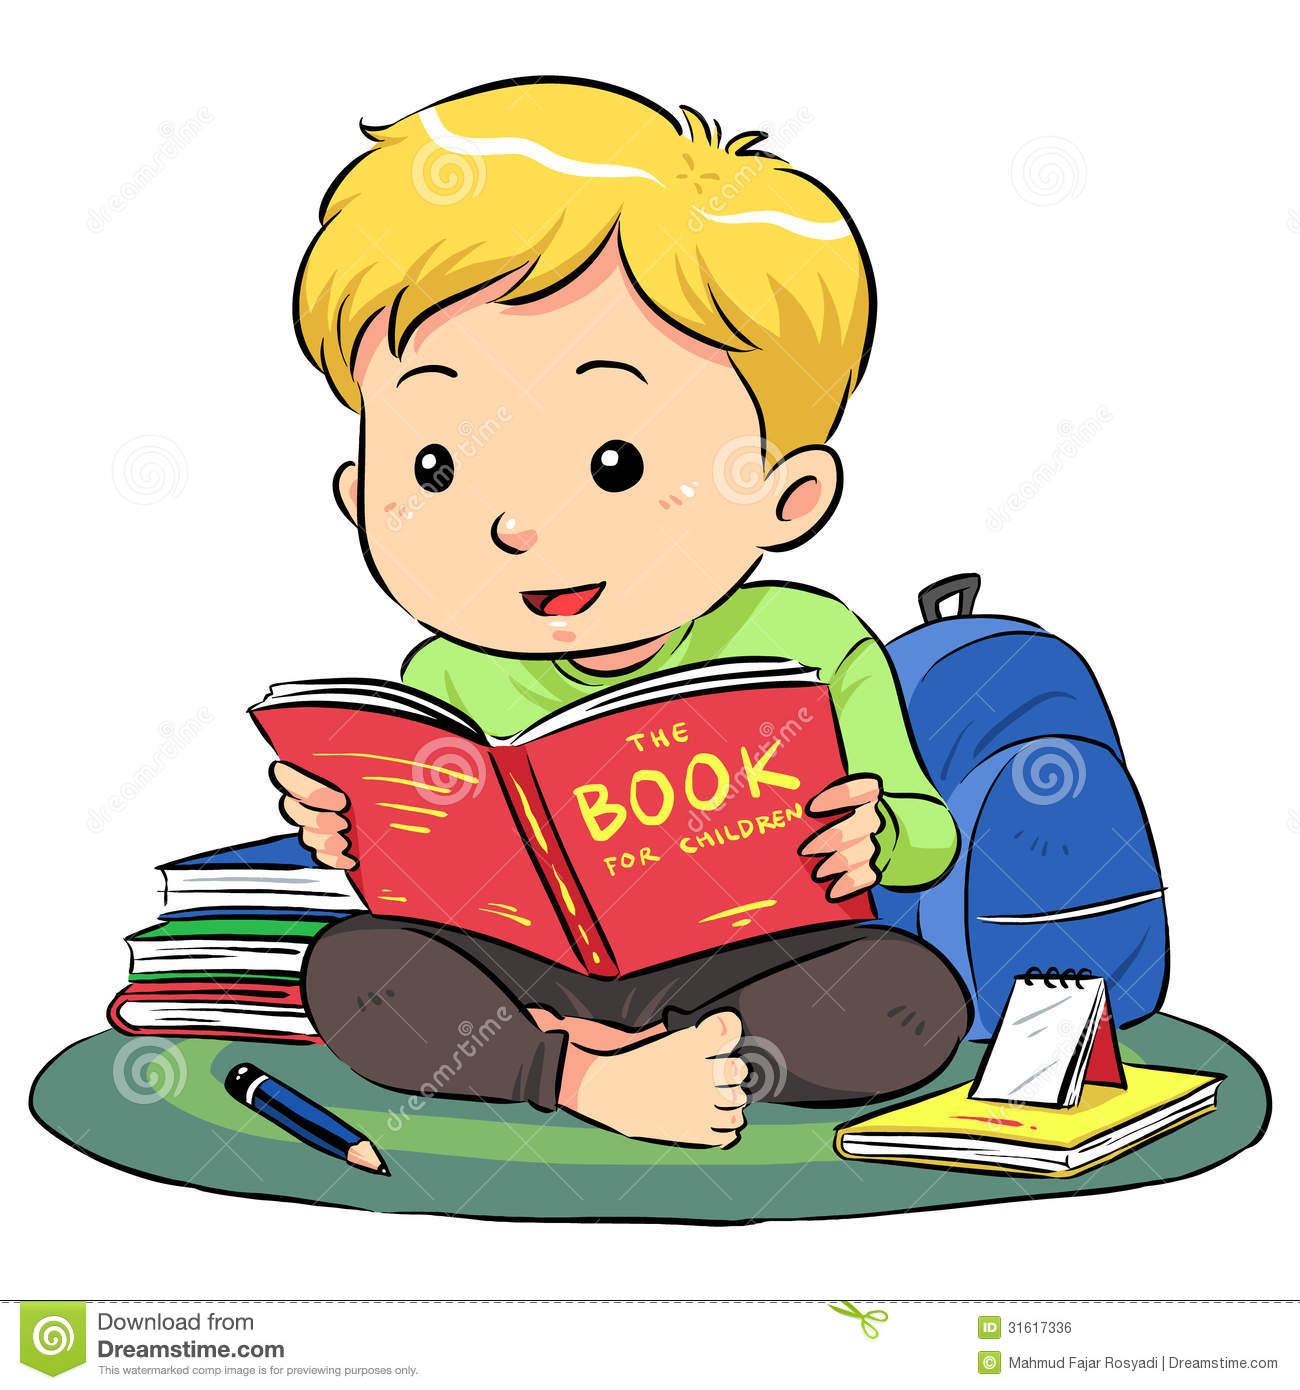 Boy reading books clip art.